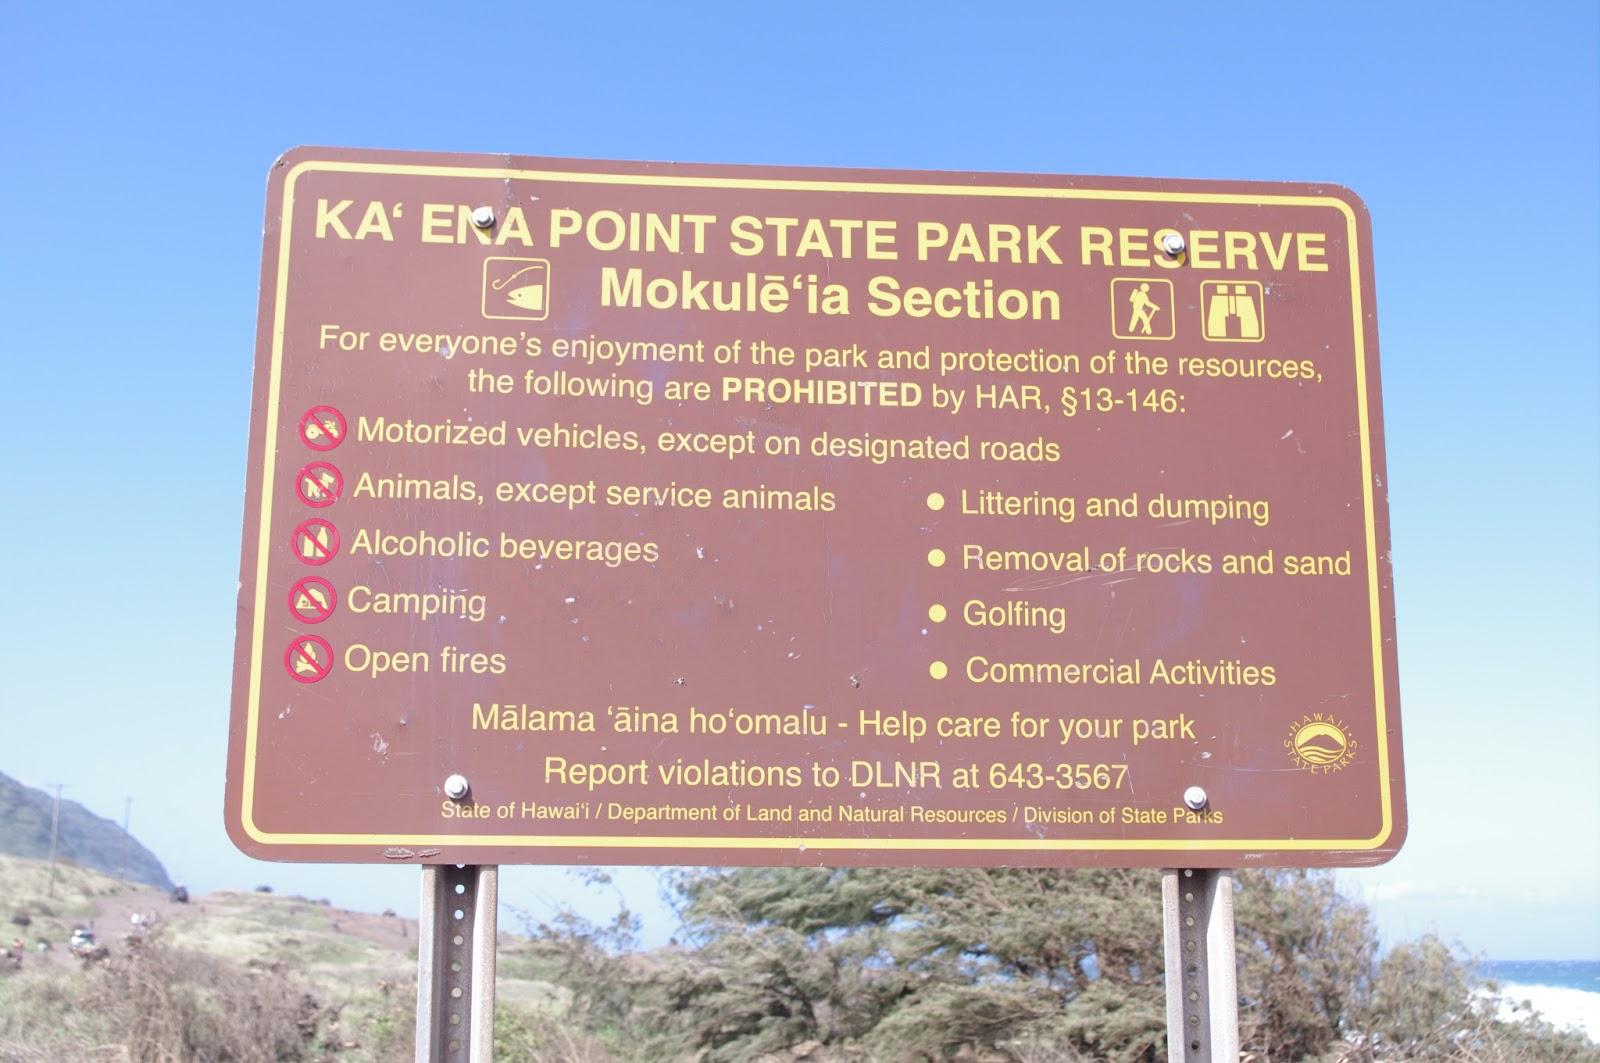 Ka'ena Point State Park   Mark Shoberg: The Dumb Tourist